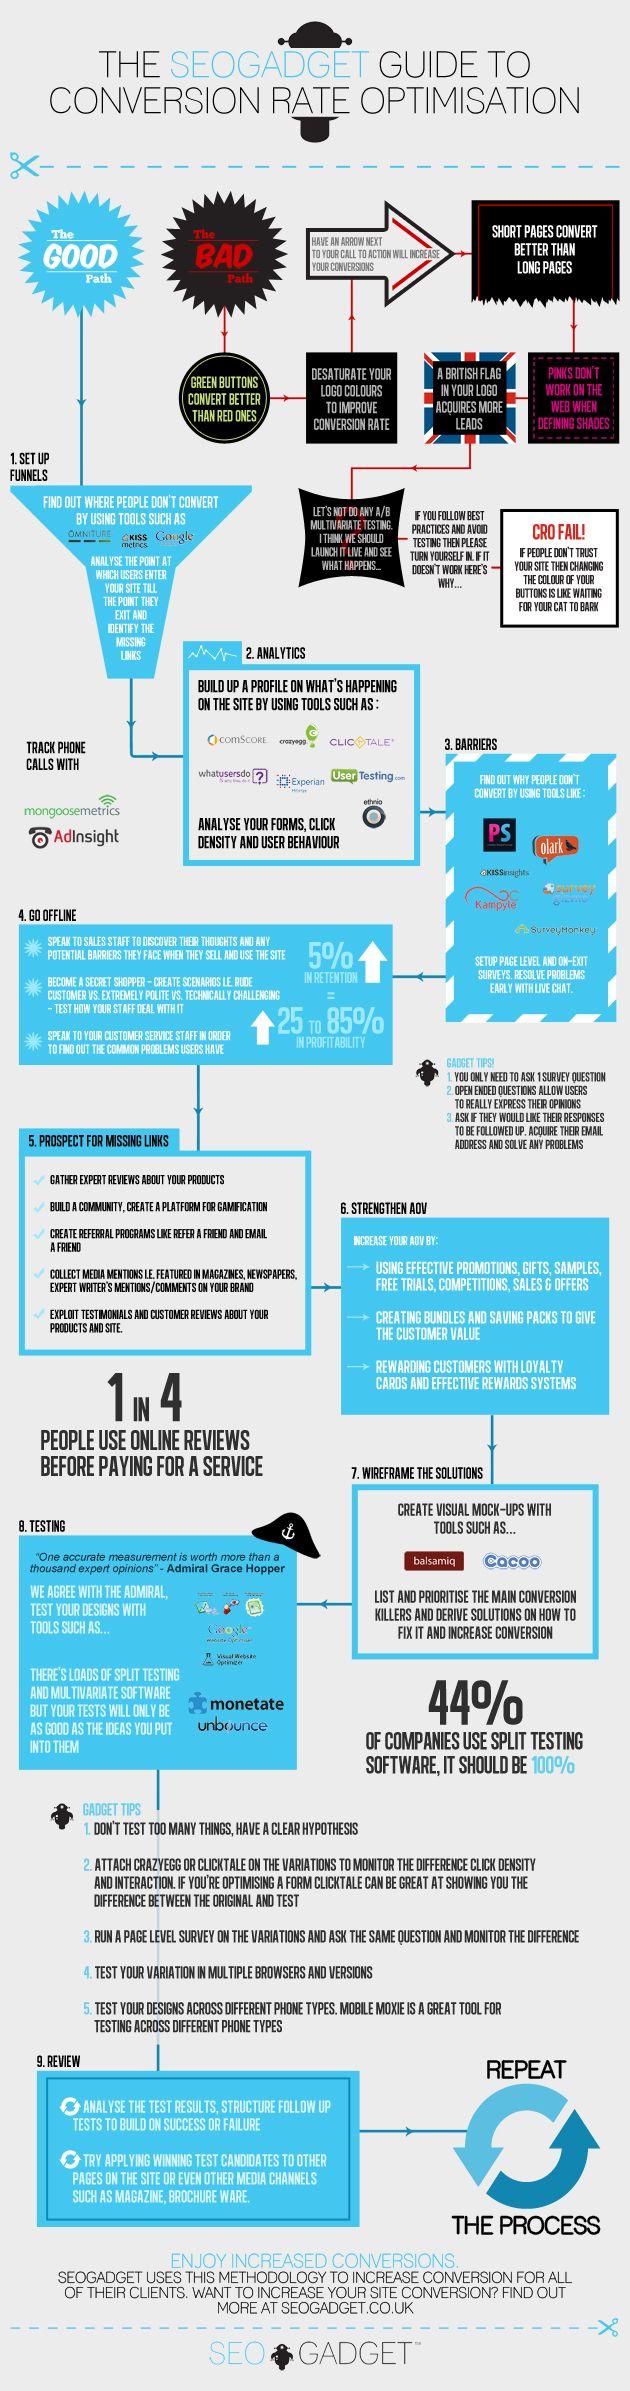 CRO - Conversion Rate Optimisation #infographic #seo